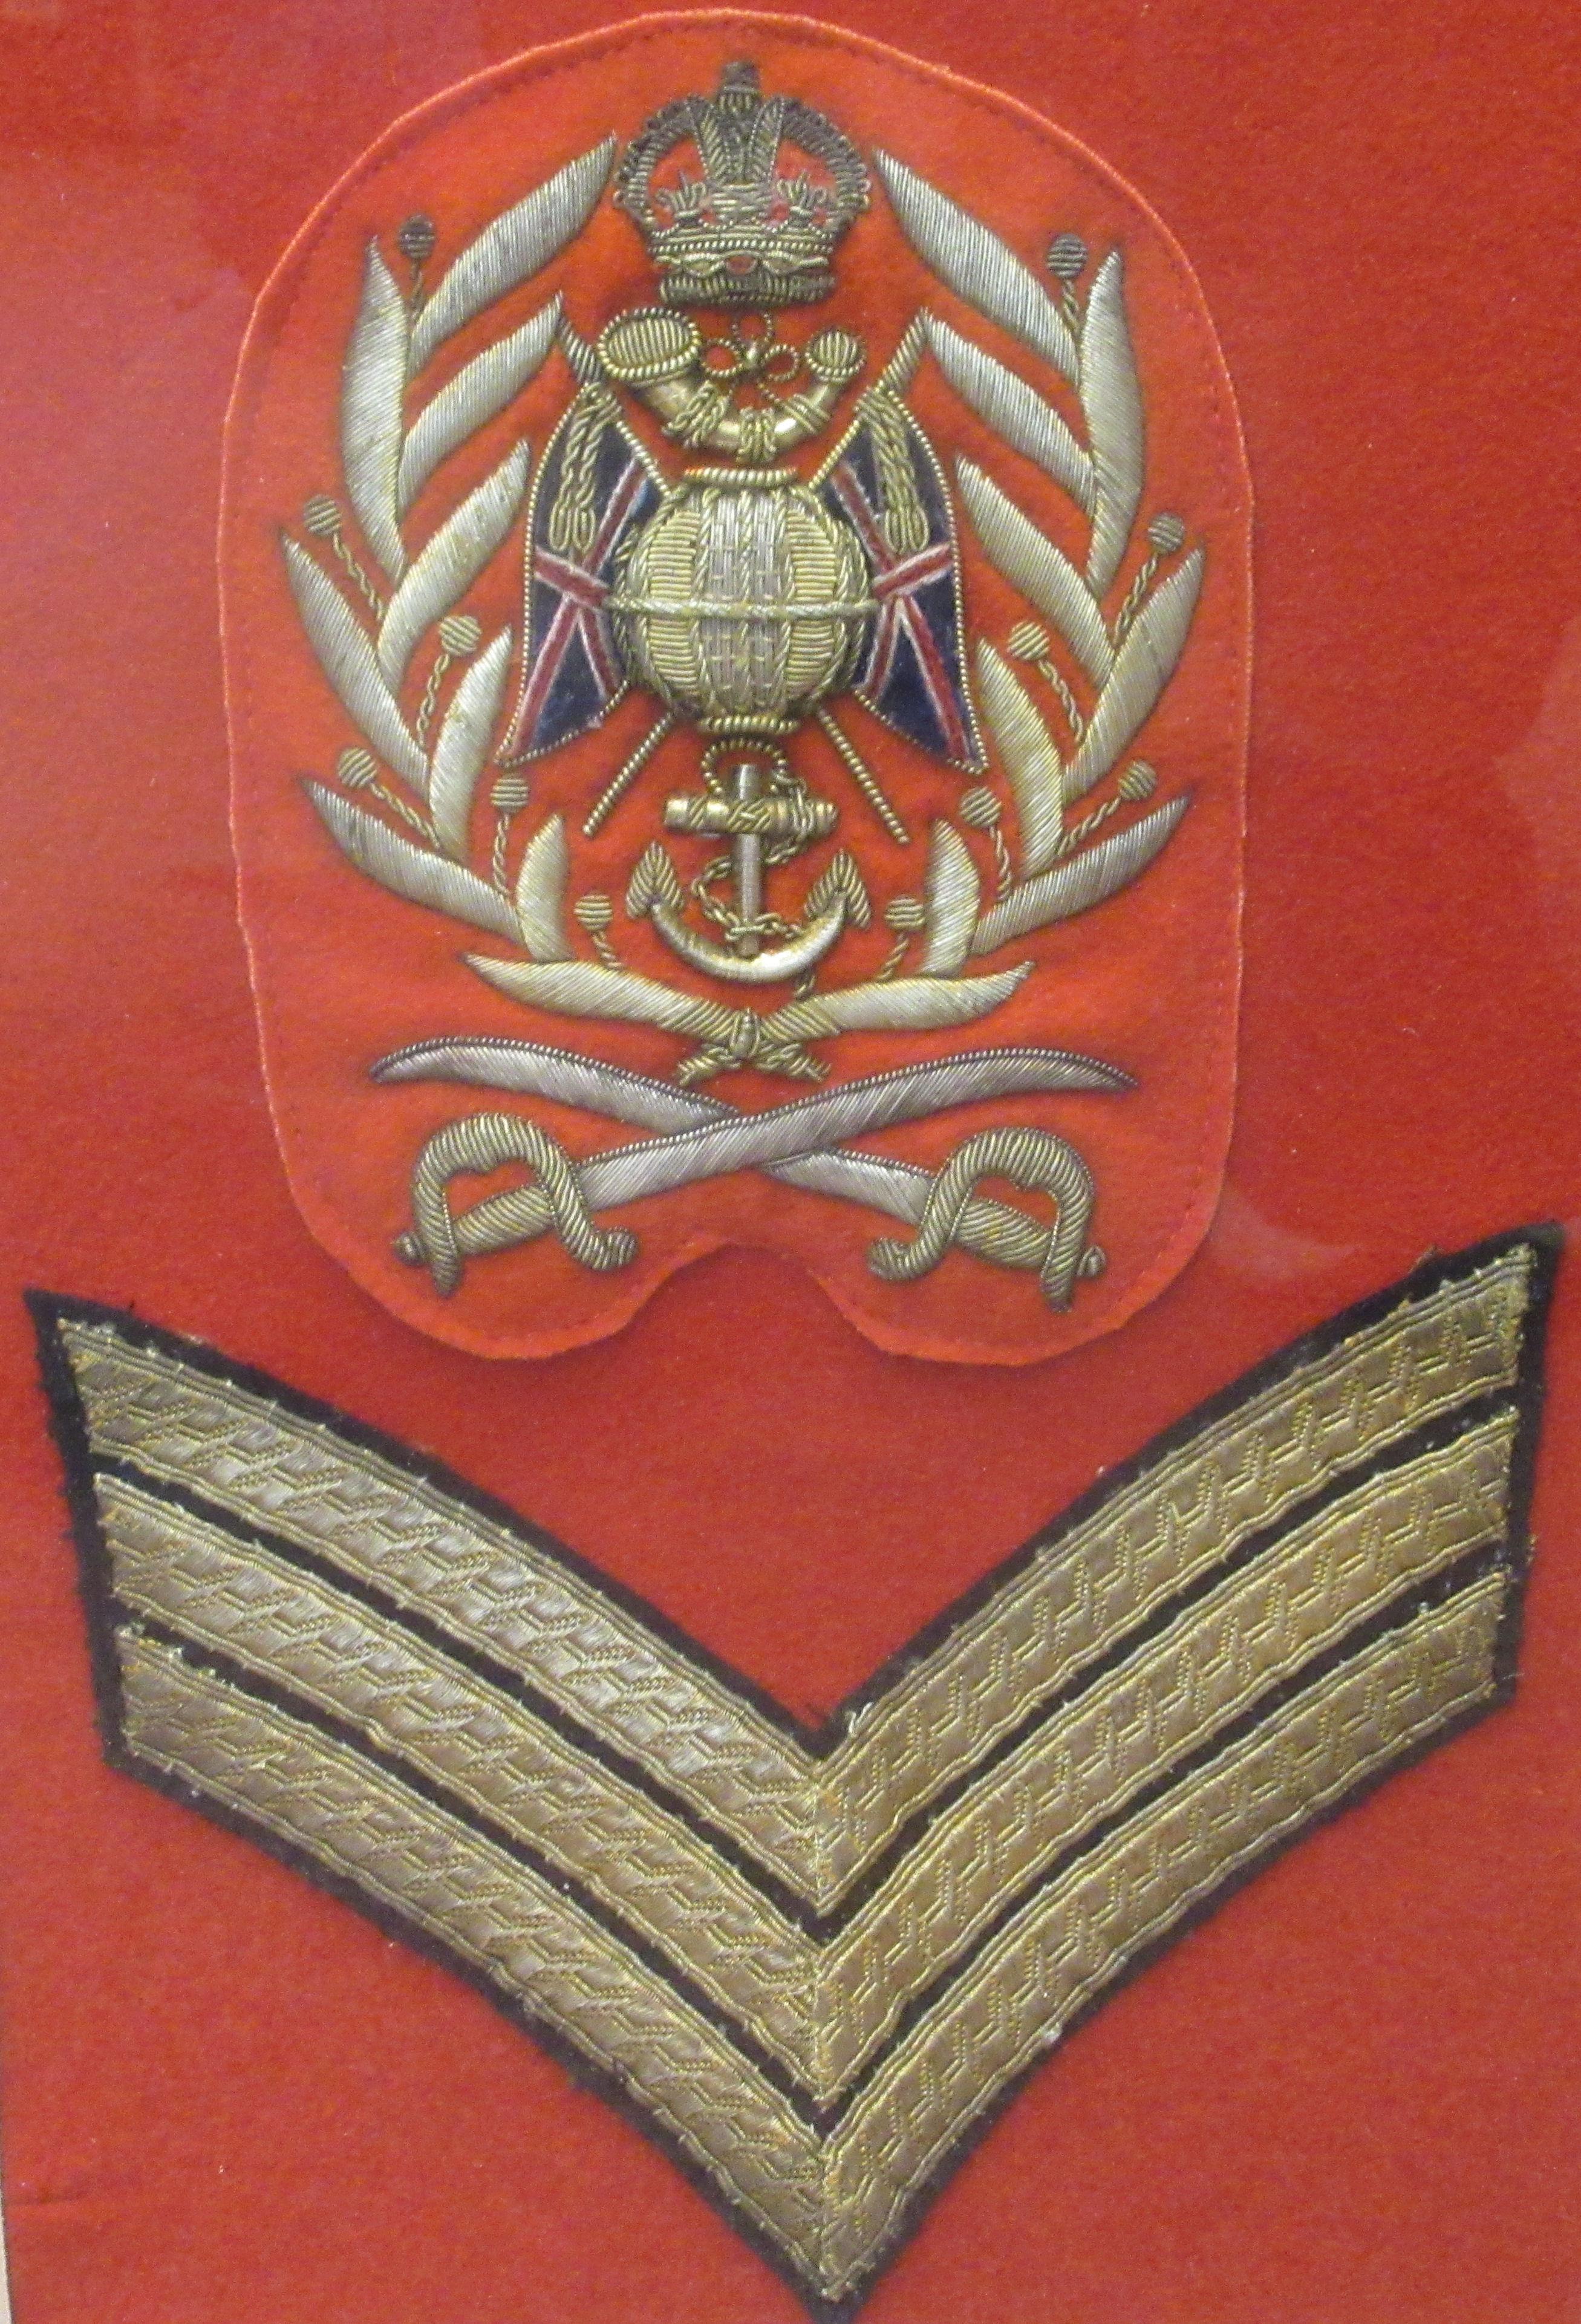 British military braided uniform insignia, viz. Colour Sergeant Royal Marines Light Infantry( - Image 3 of 4